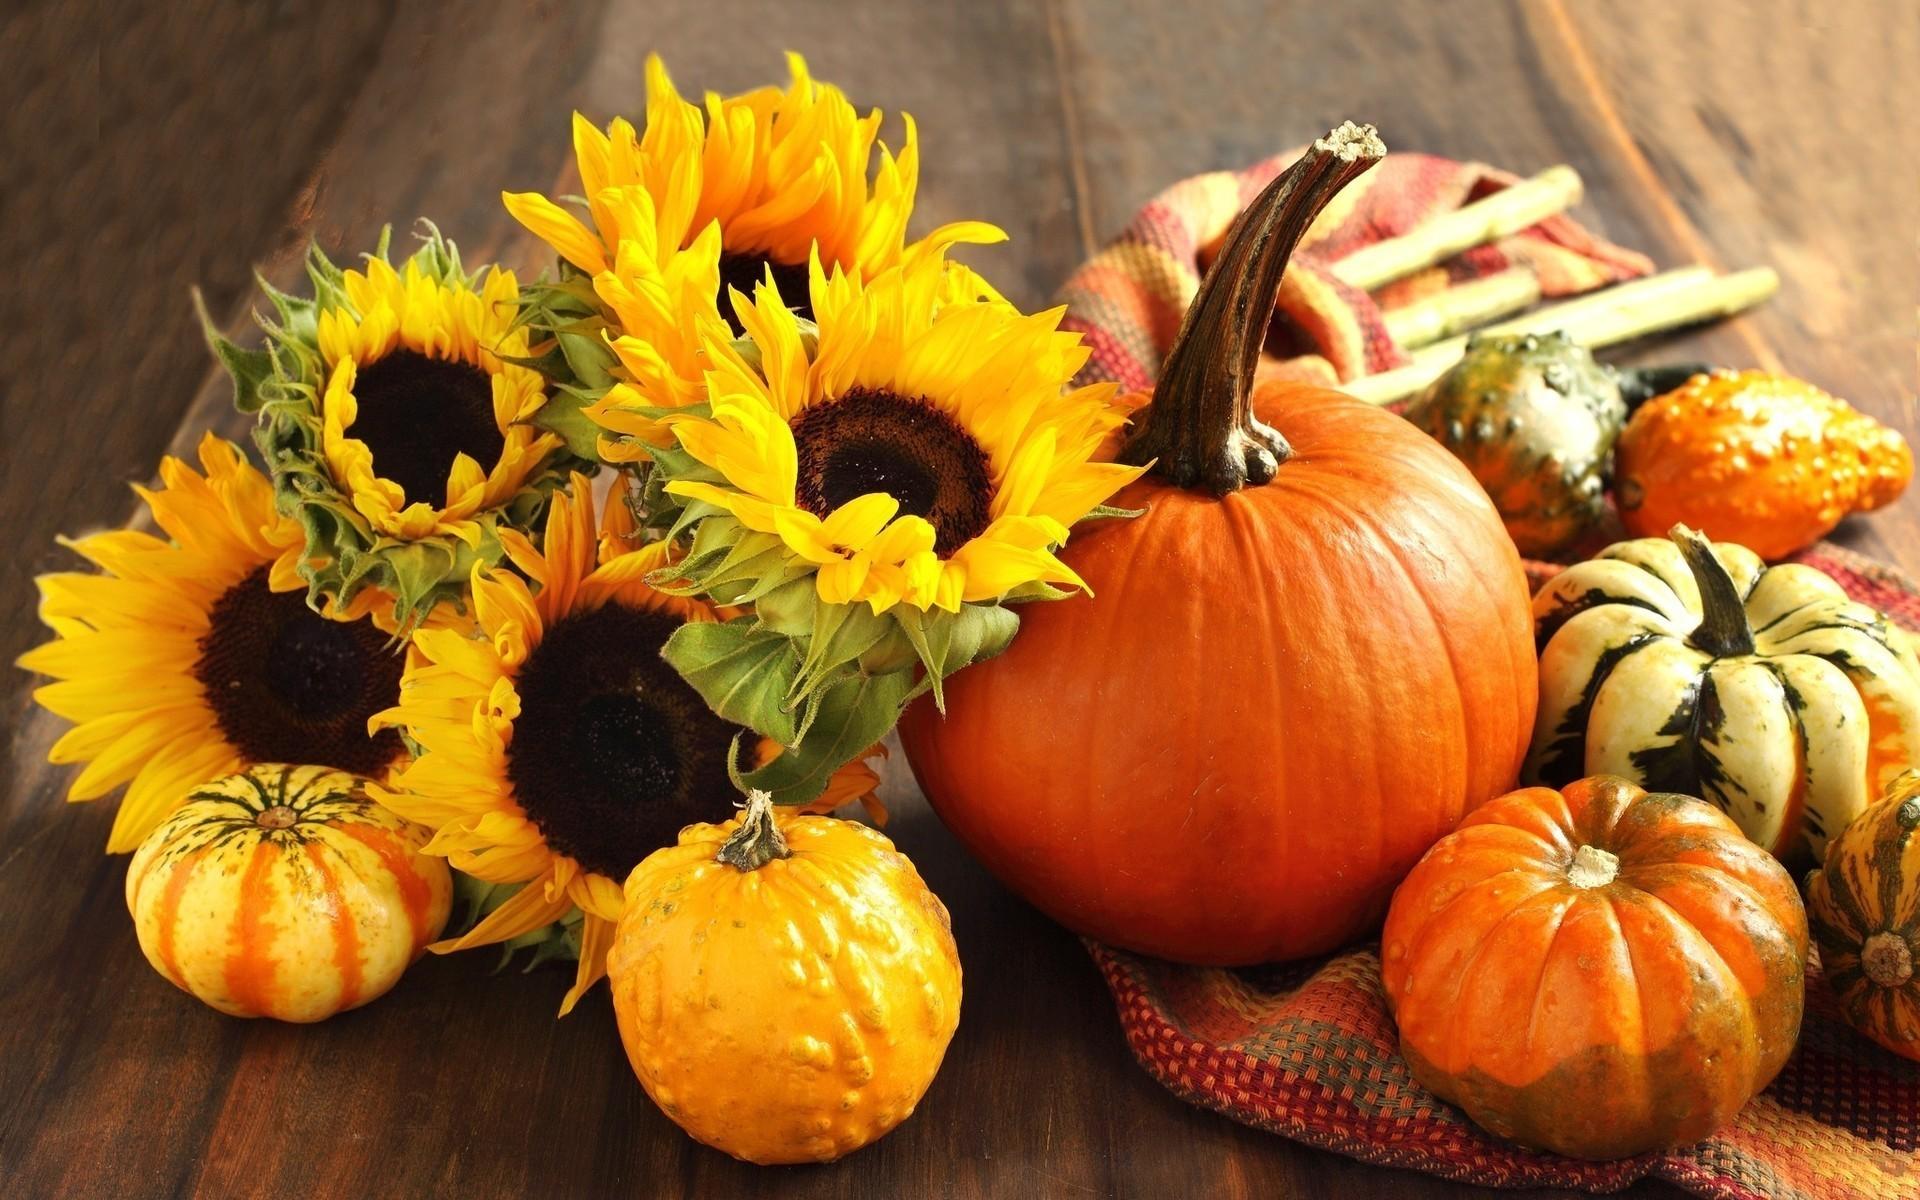 flowers fruits harvest sunflowers pumpkins Squash cloth wallpaper .